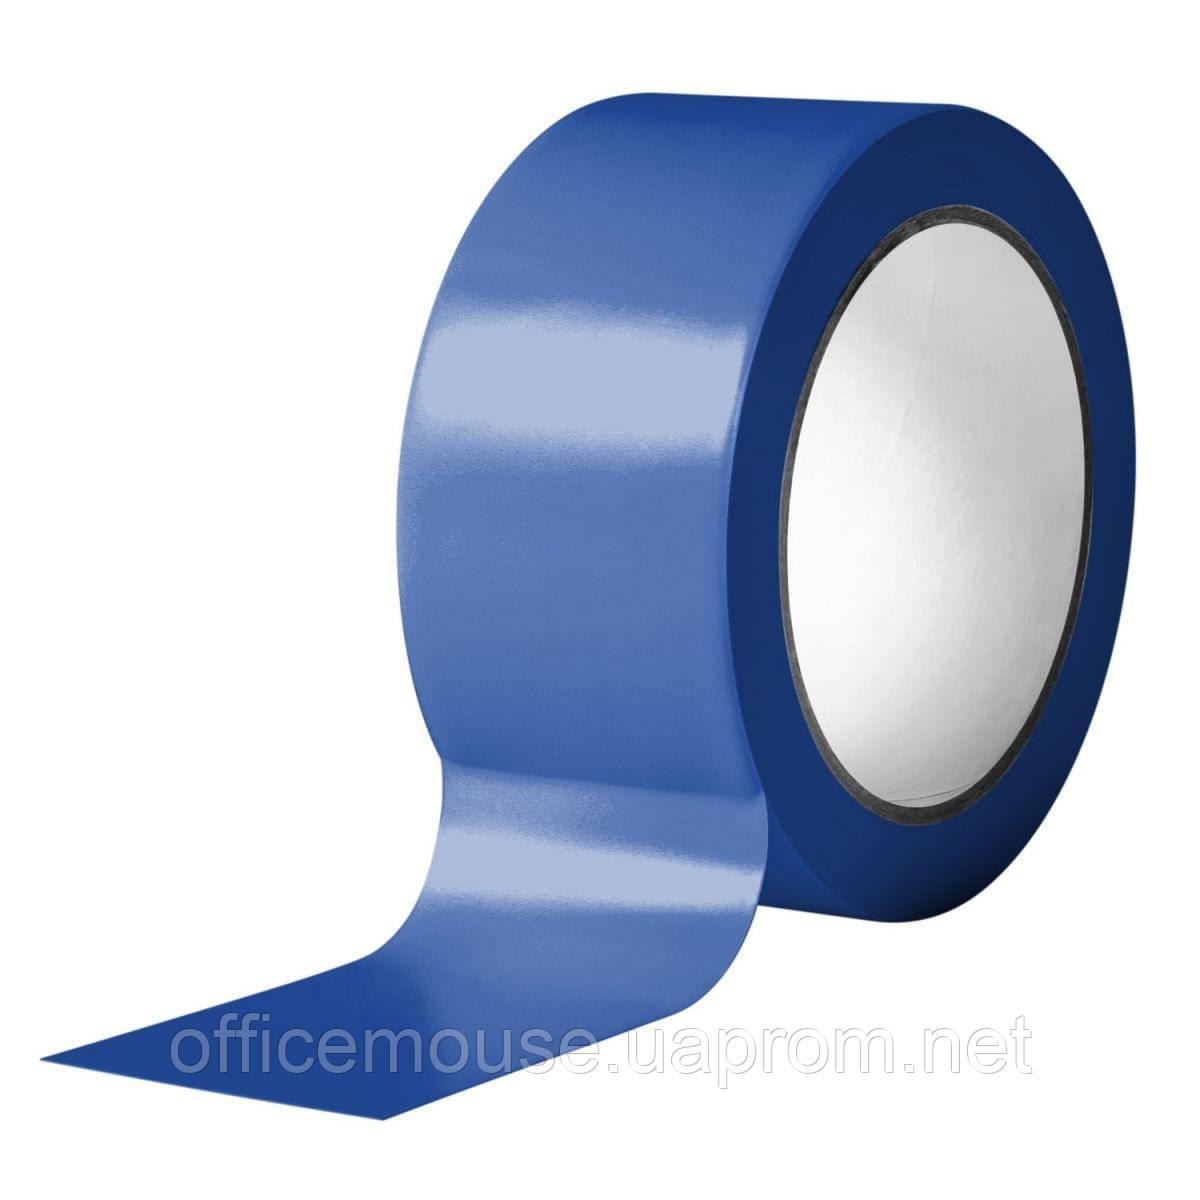 Клейка стрічка пакувальна 48 мм х 50 м х 40 мкм, синя